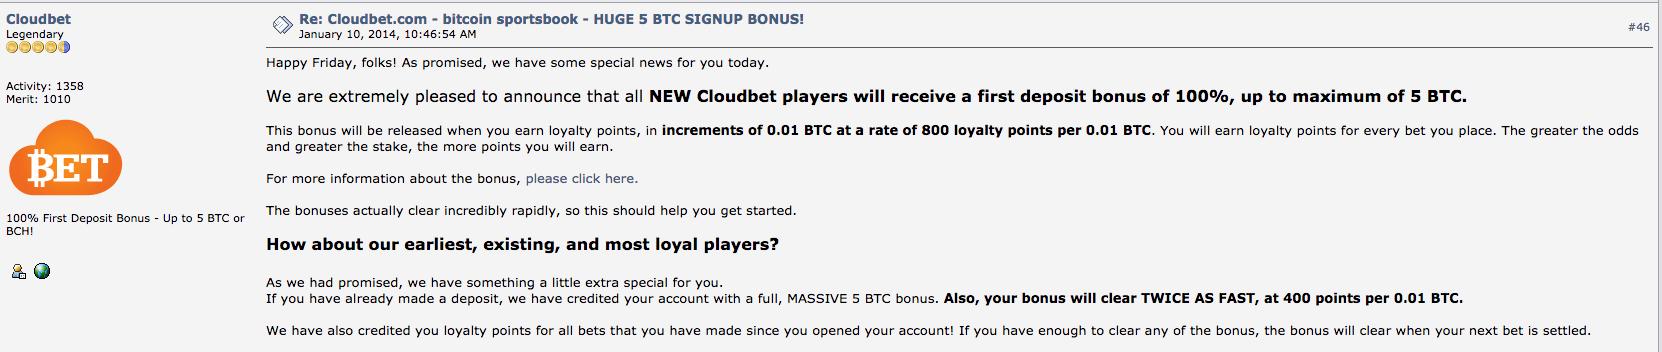 BitcoinTalk Cloudbet Loyalty Scheme